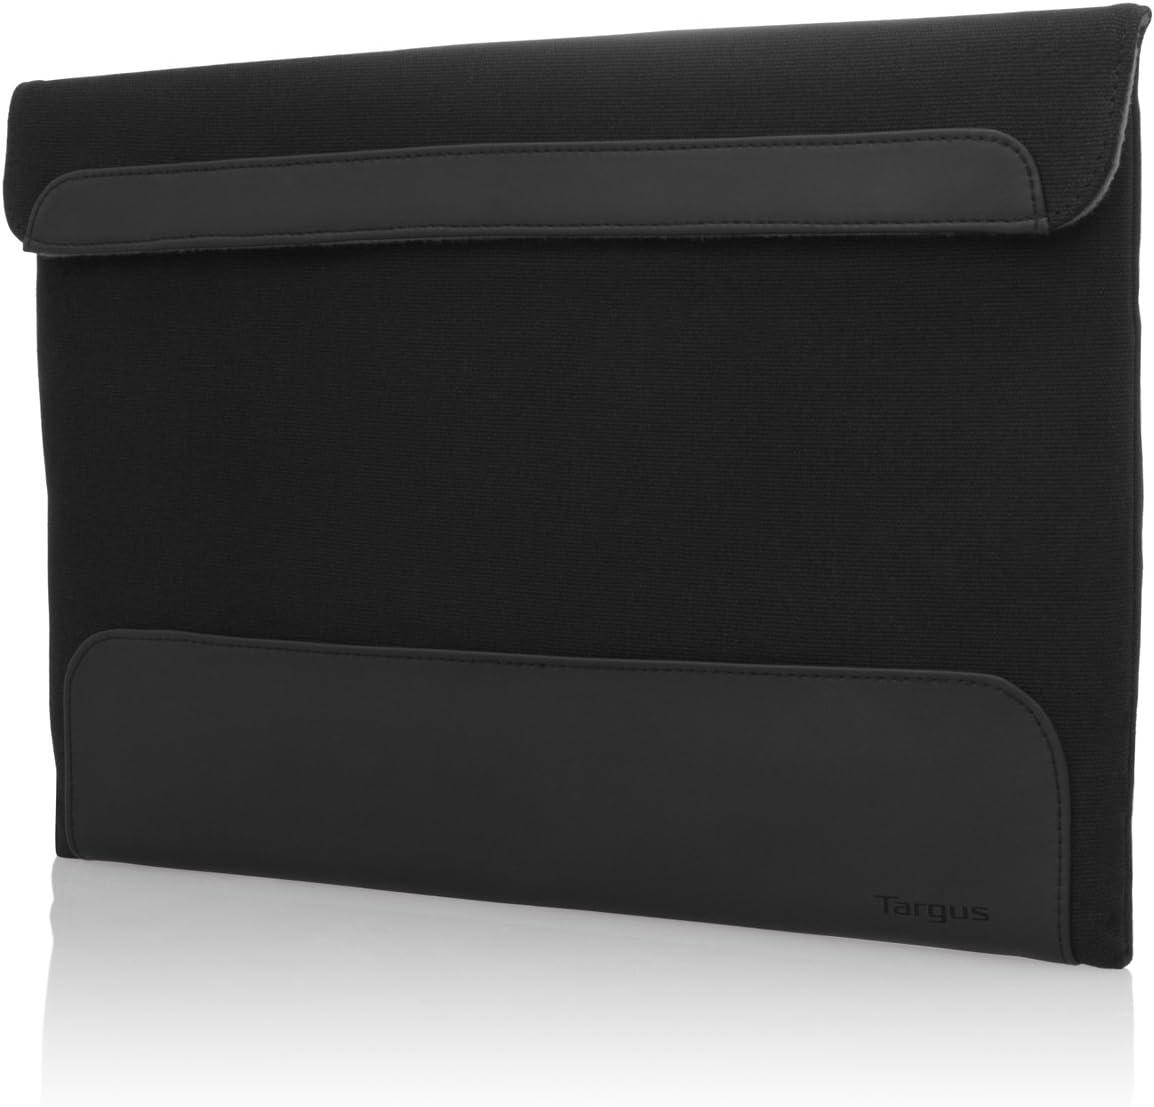 Targus Ultralife Thin Canvas Sleeve for 13.3-Inch Ultrabooks/Macbook Air, Onyx (TTS001US)